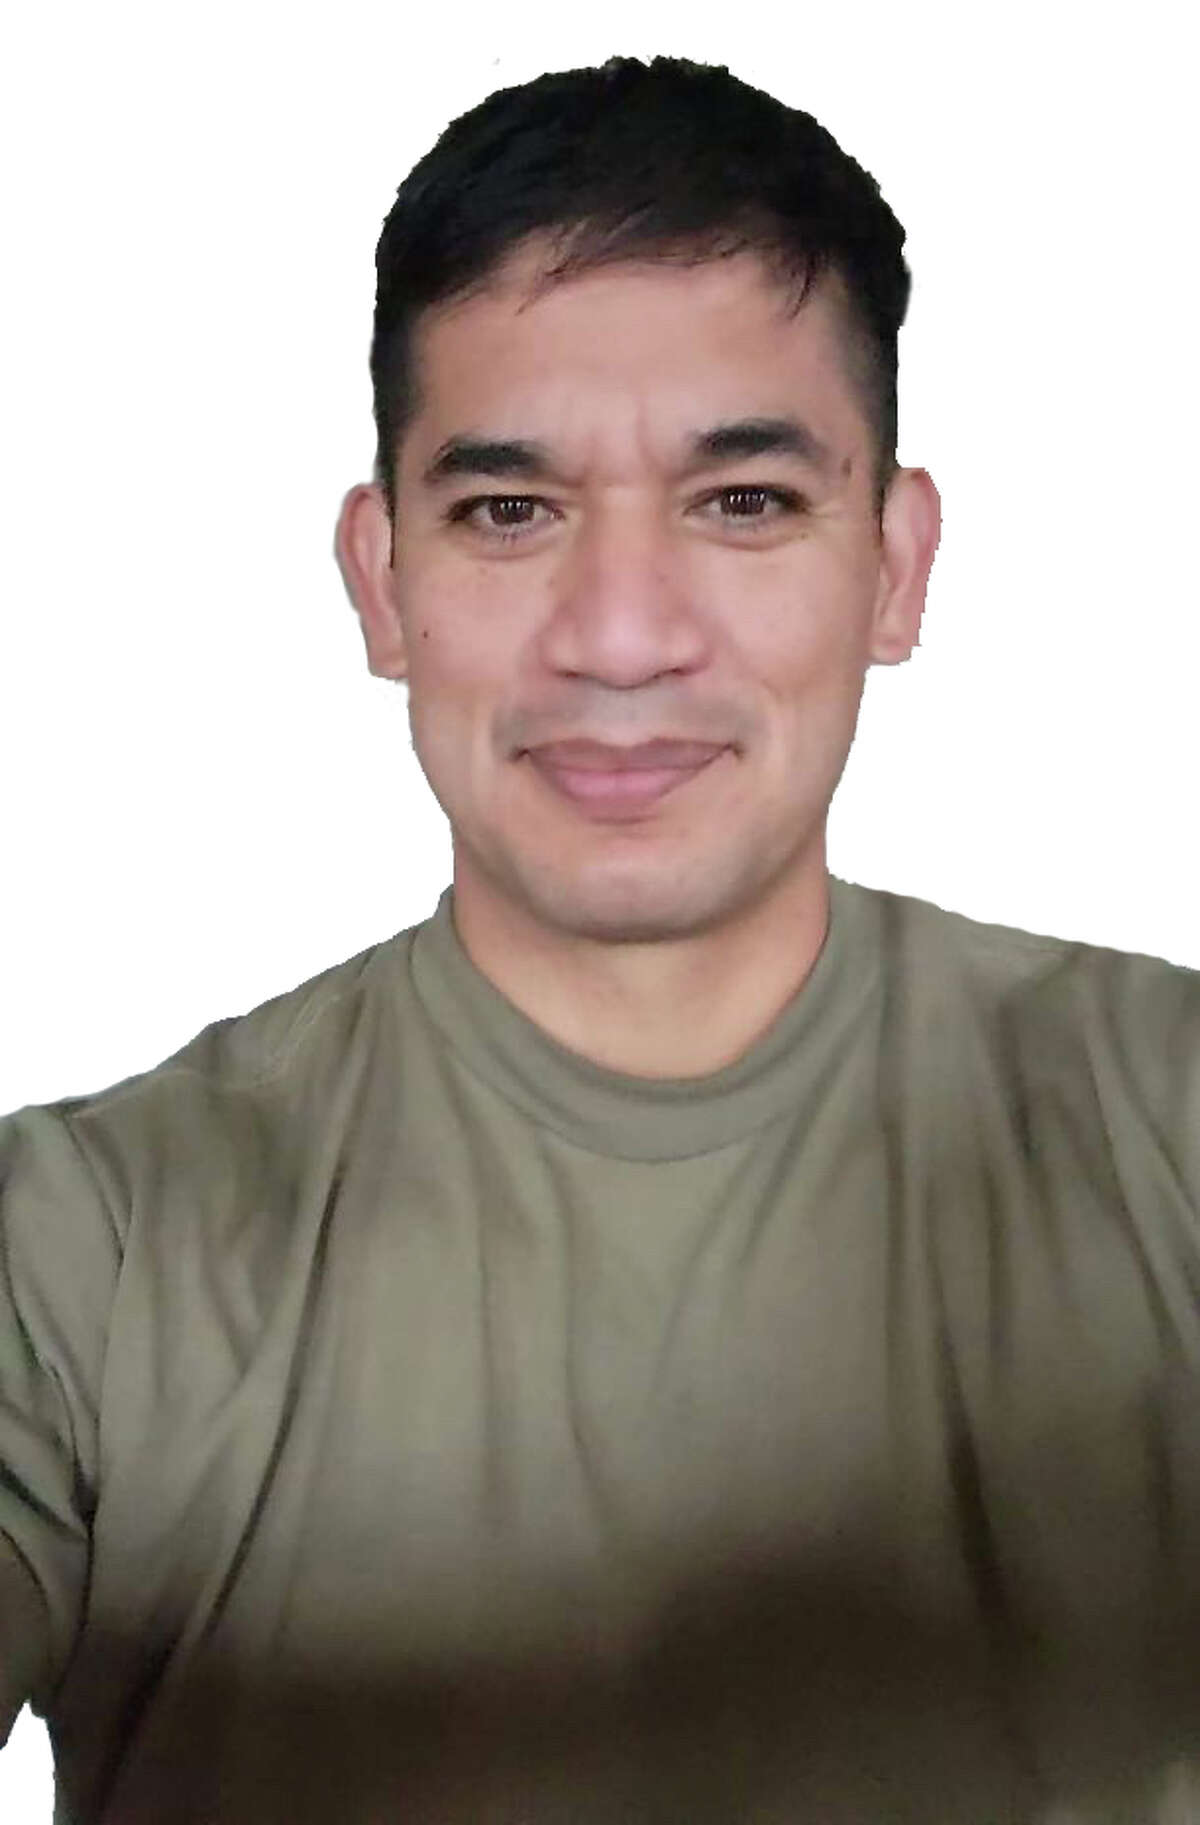 Jose Fermin Tristan, Jr.